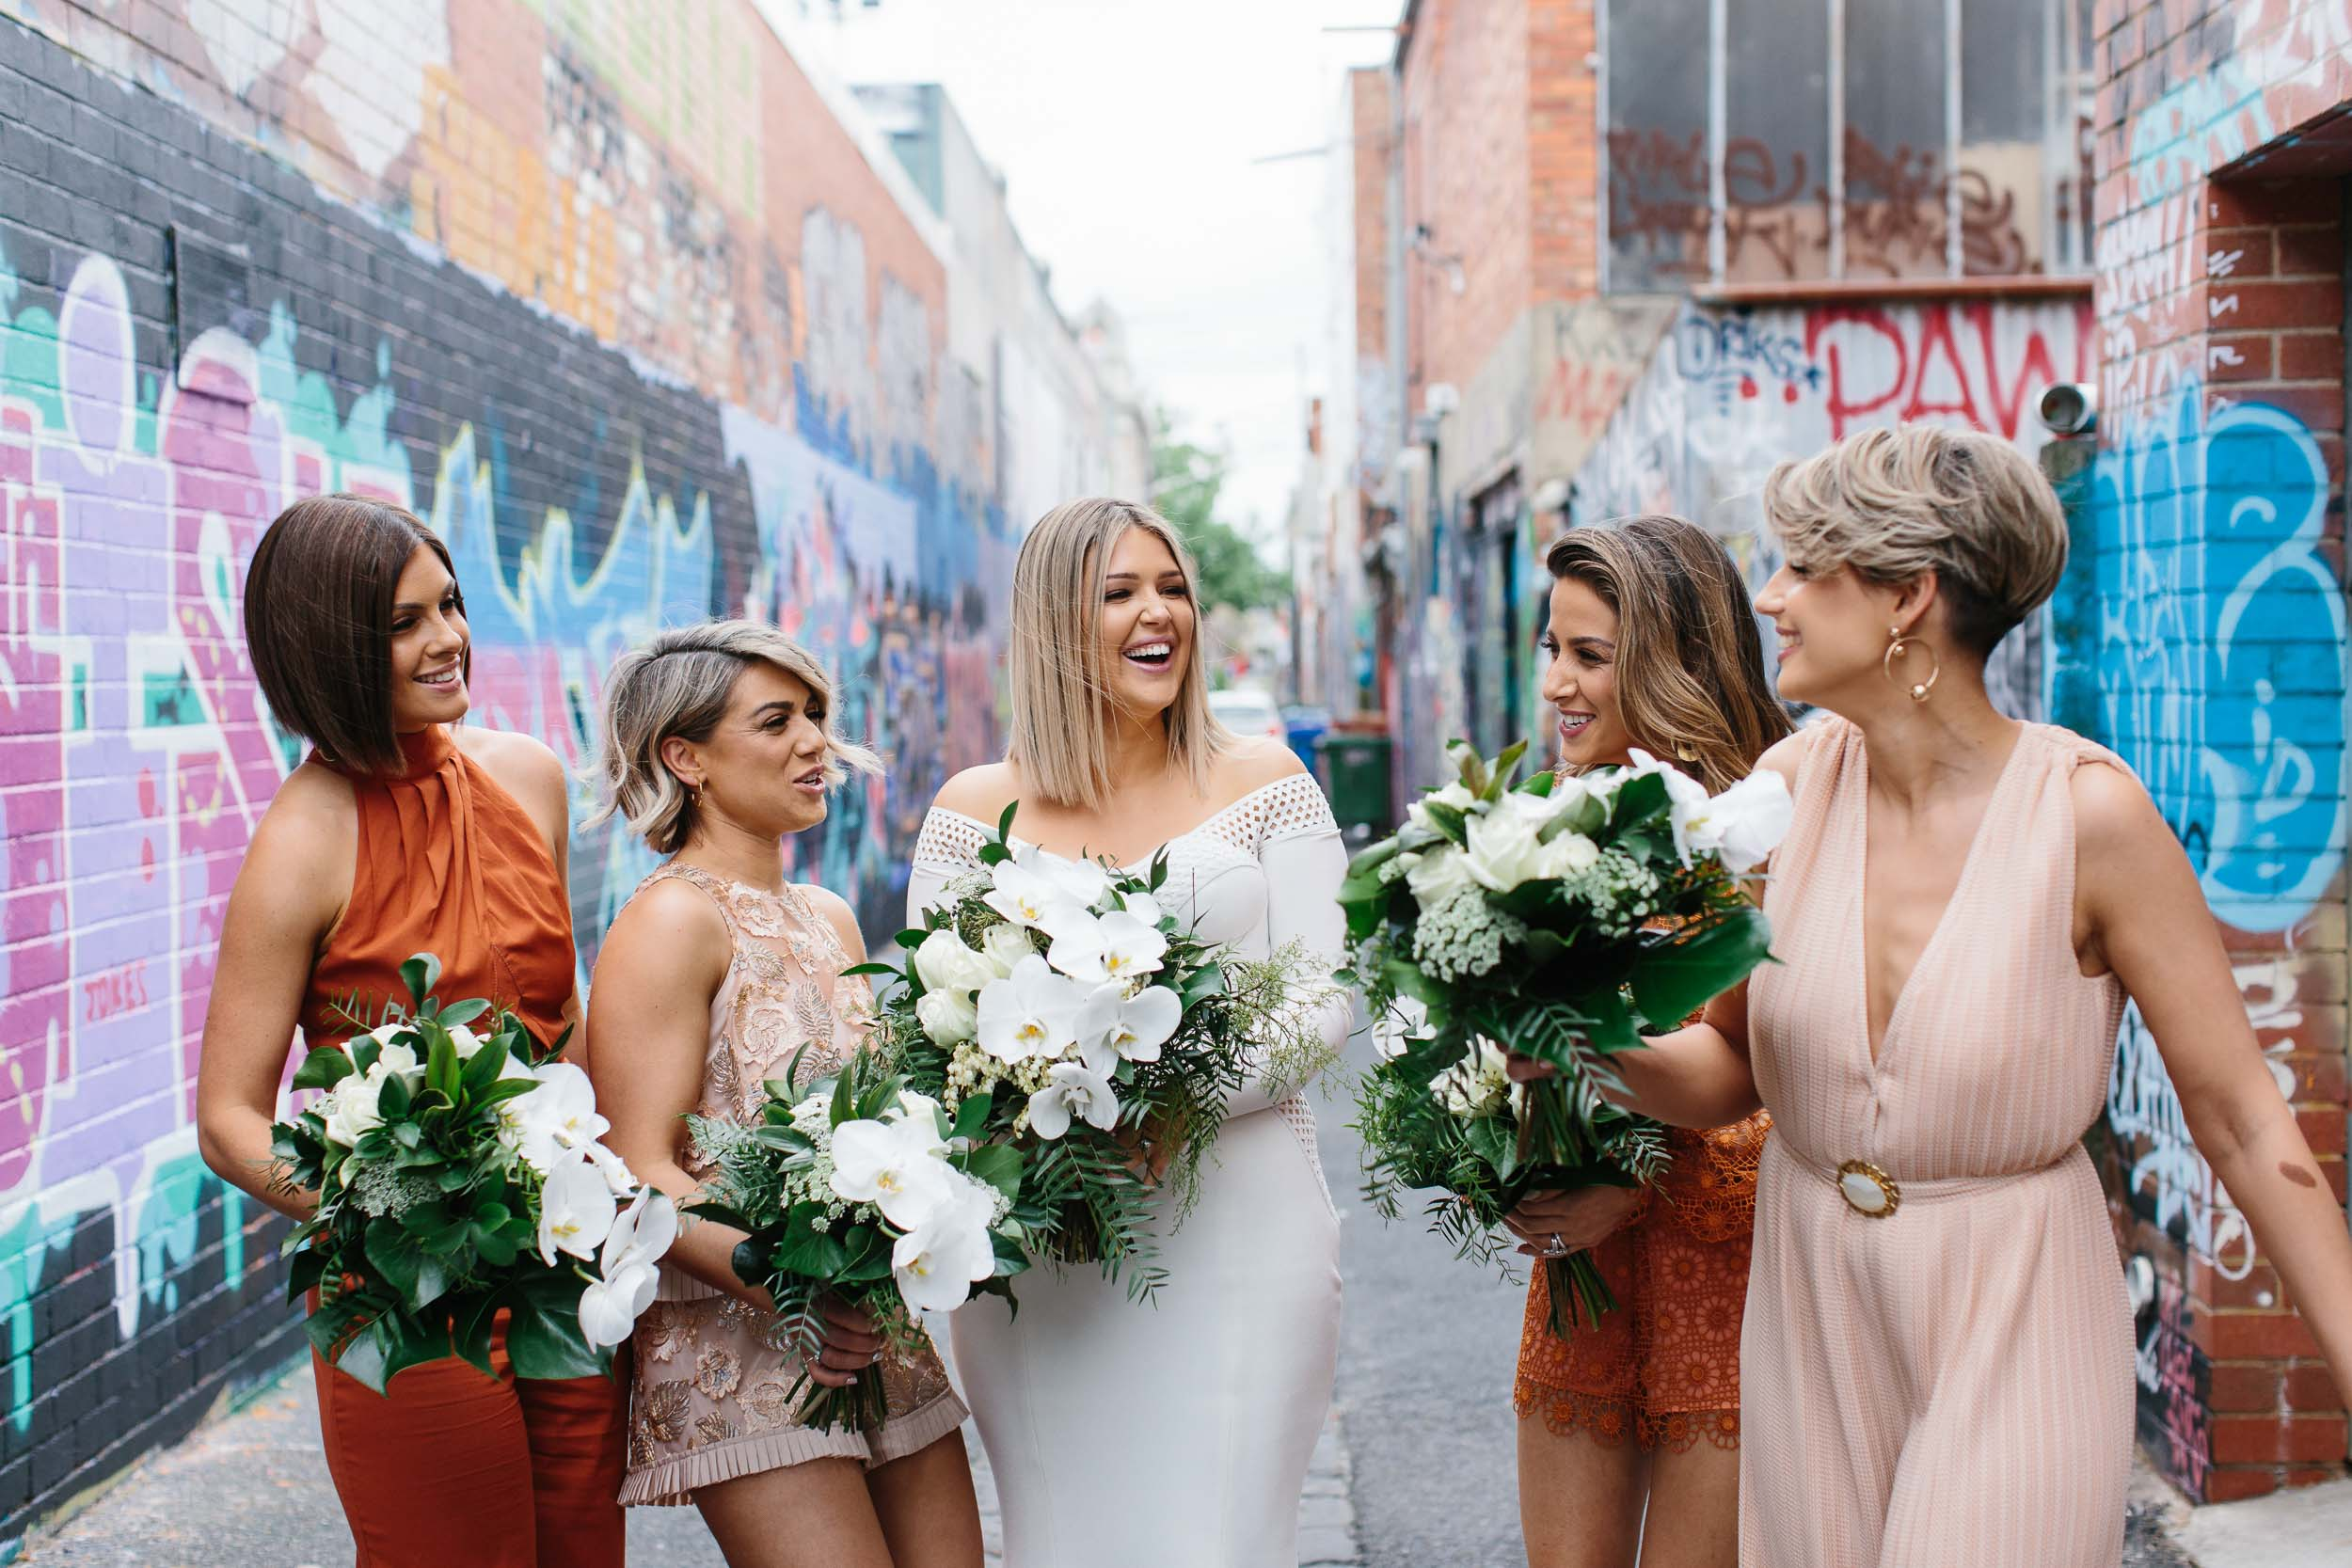 Kas-Richards-Urban-Melbourne-Wedding-Jason-Grech-429.jpg